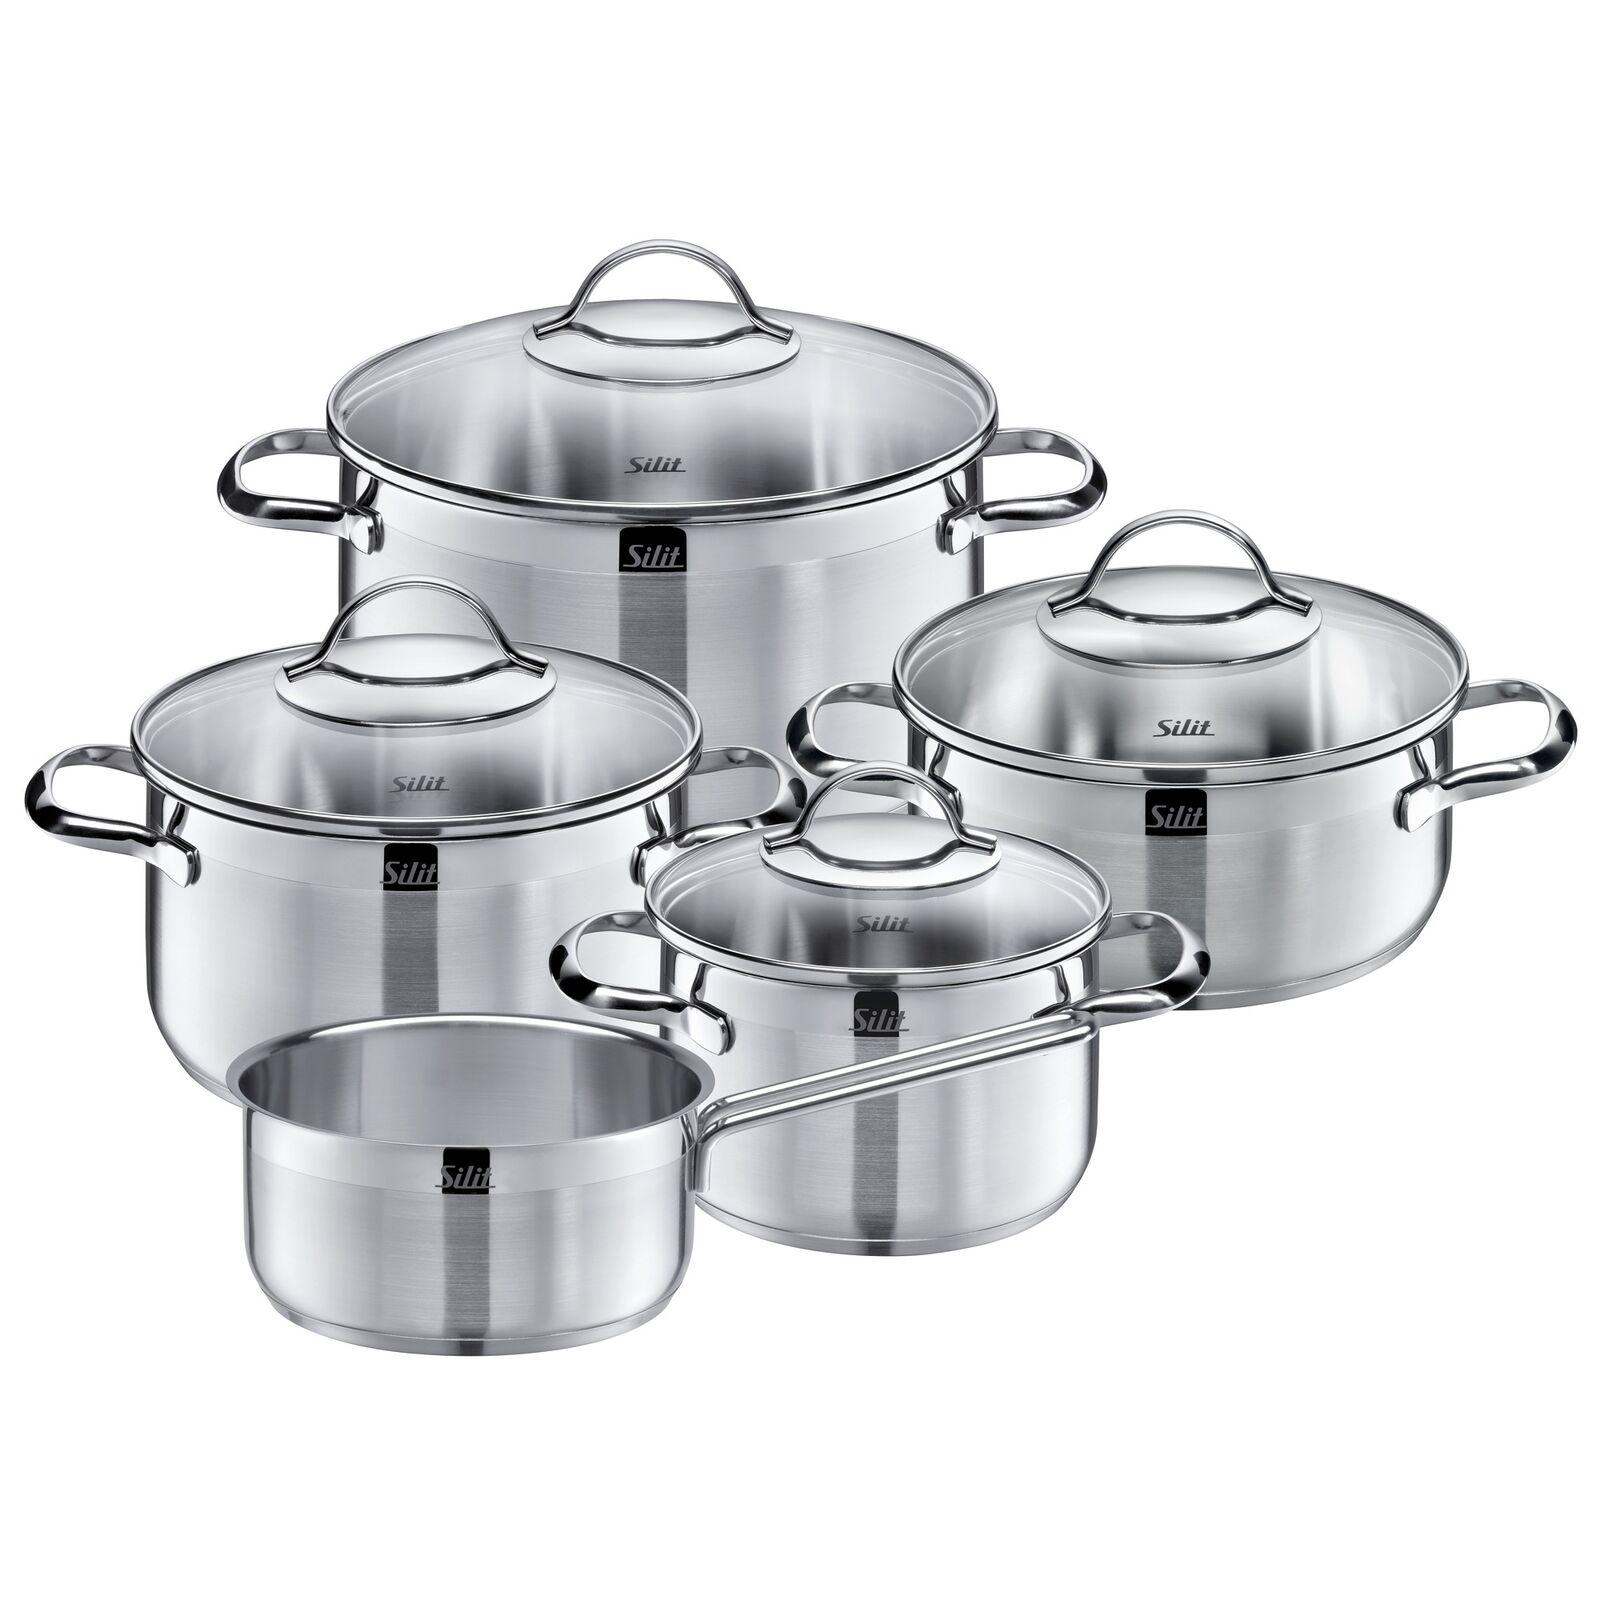 Silit Ustensiles de Cuisine-Set 5 Pièces Agate inox inoxydable neuf